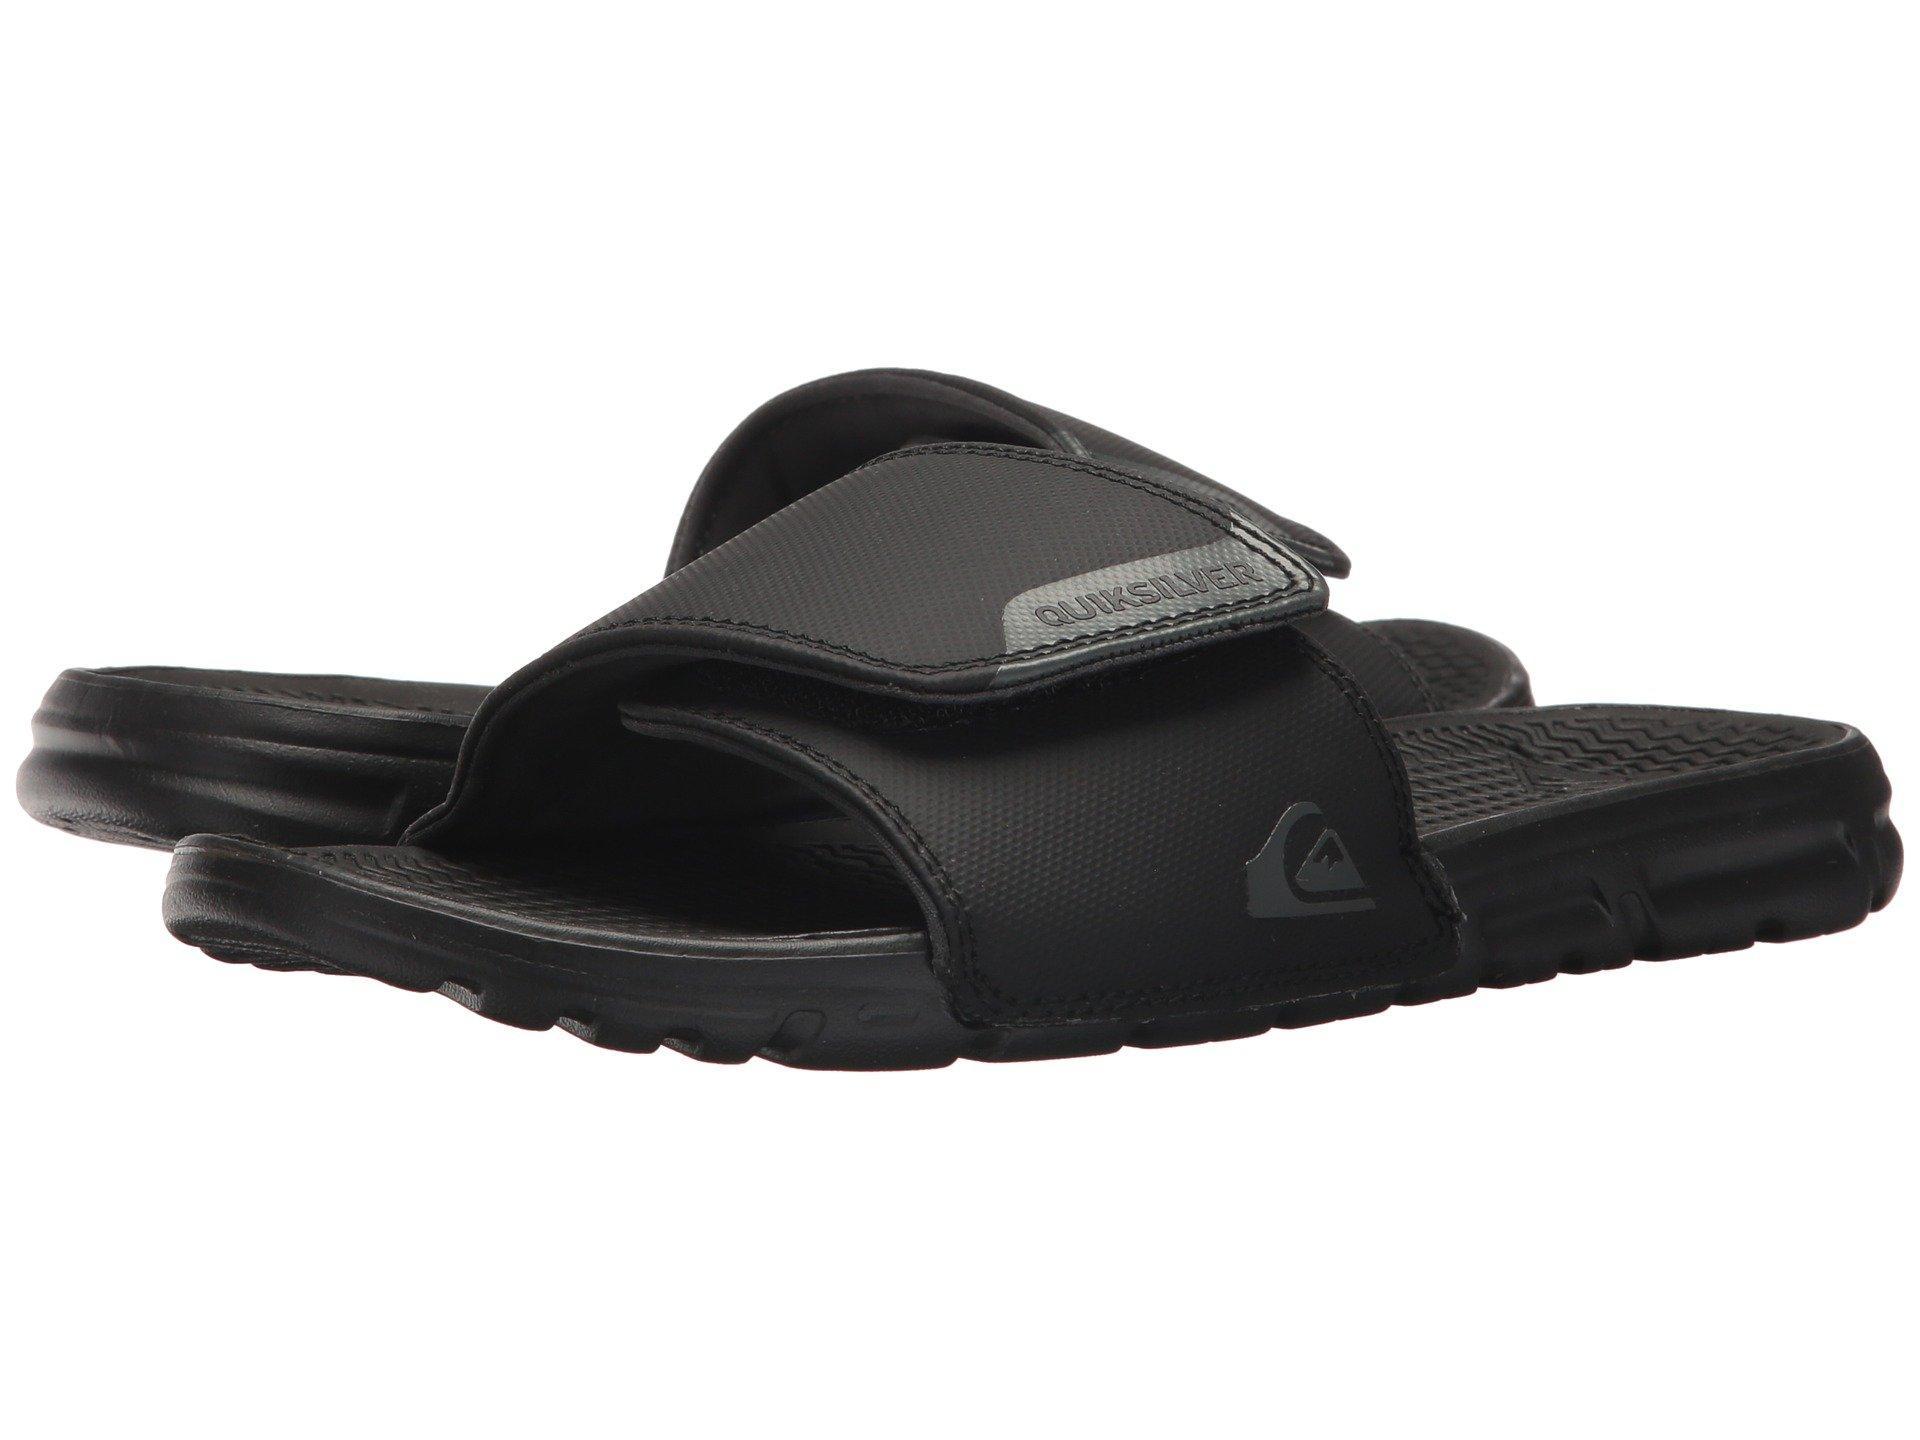 c4ae78fc23bb Lyst - Quiksilver Shoreline Adjust Slide Sandal